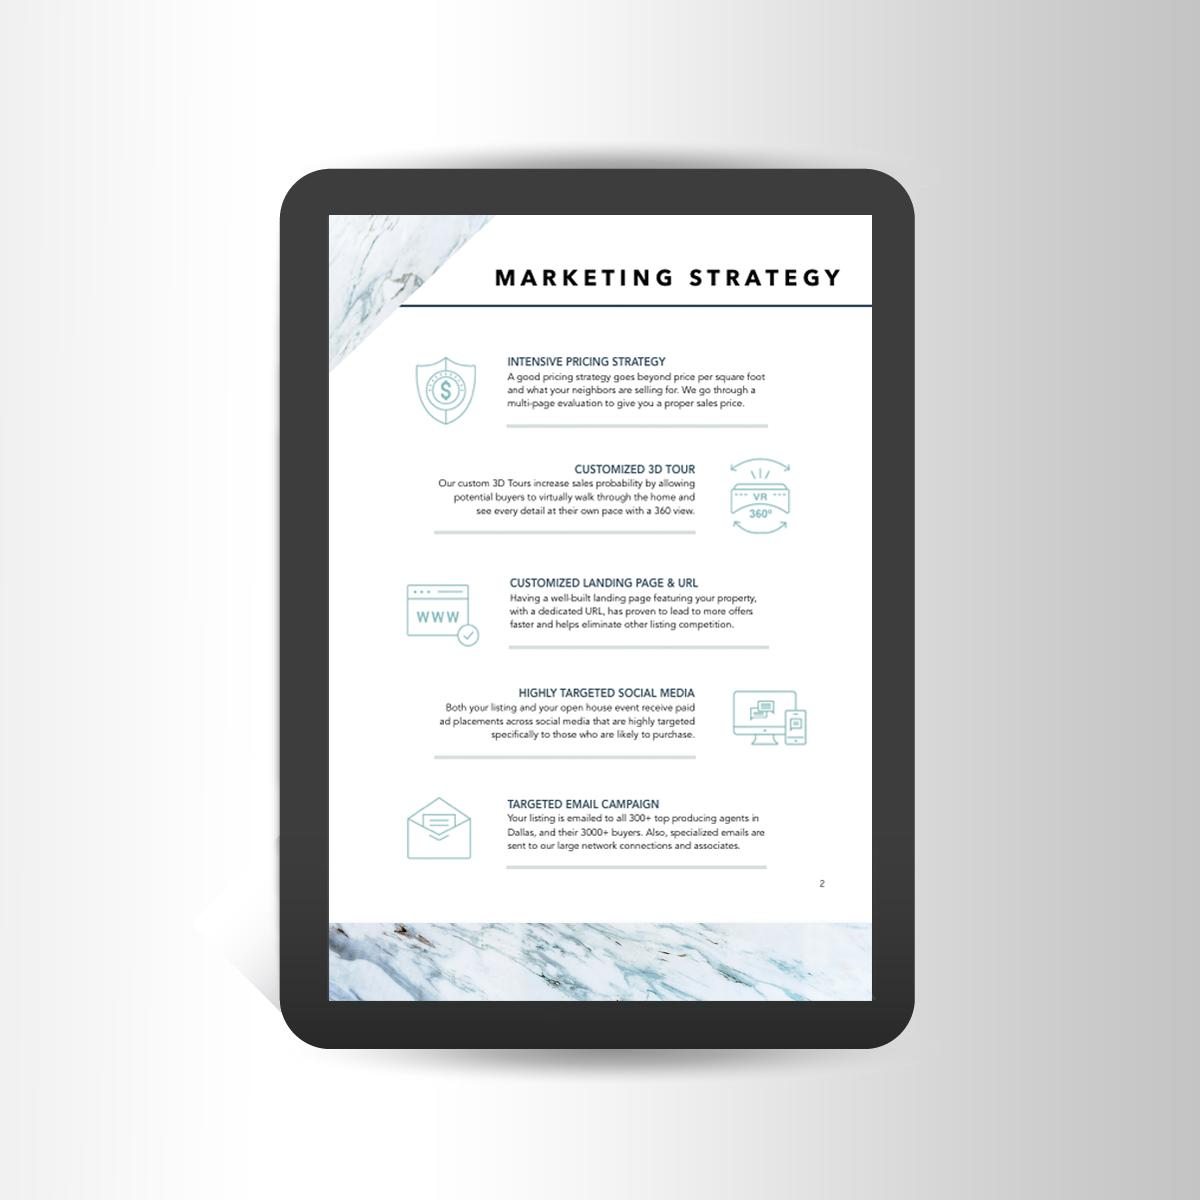 marketingstratpreview-ipad.jpg